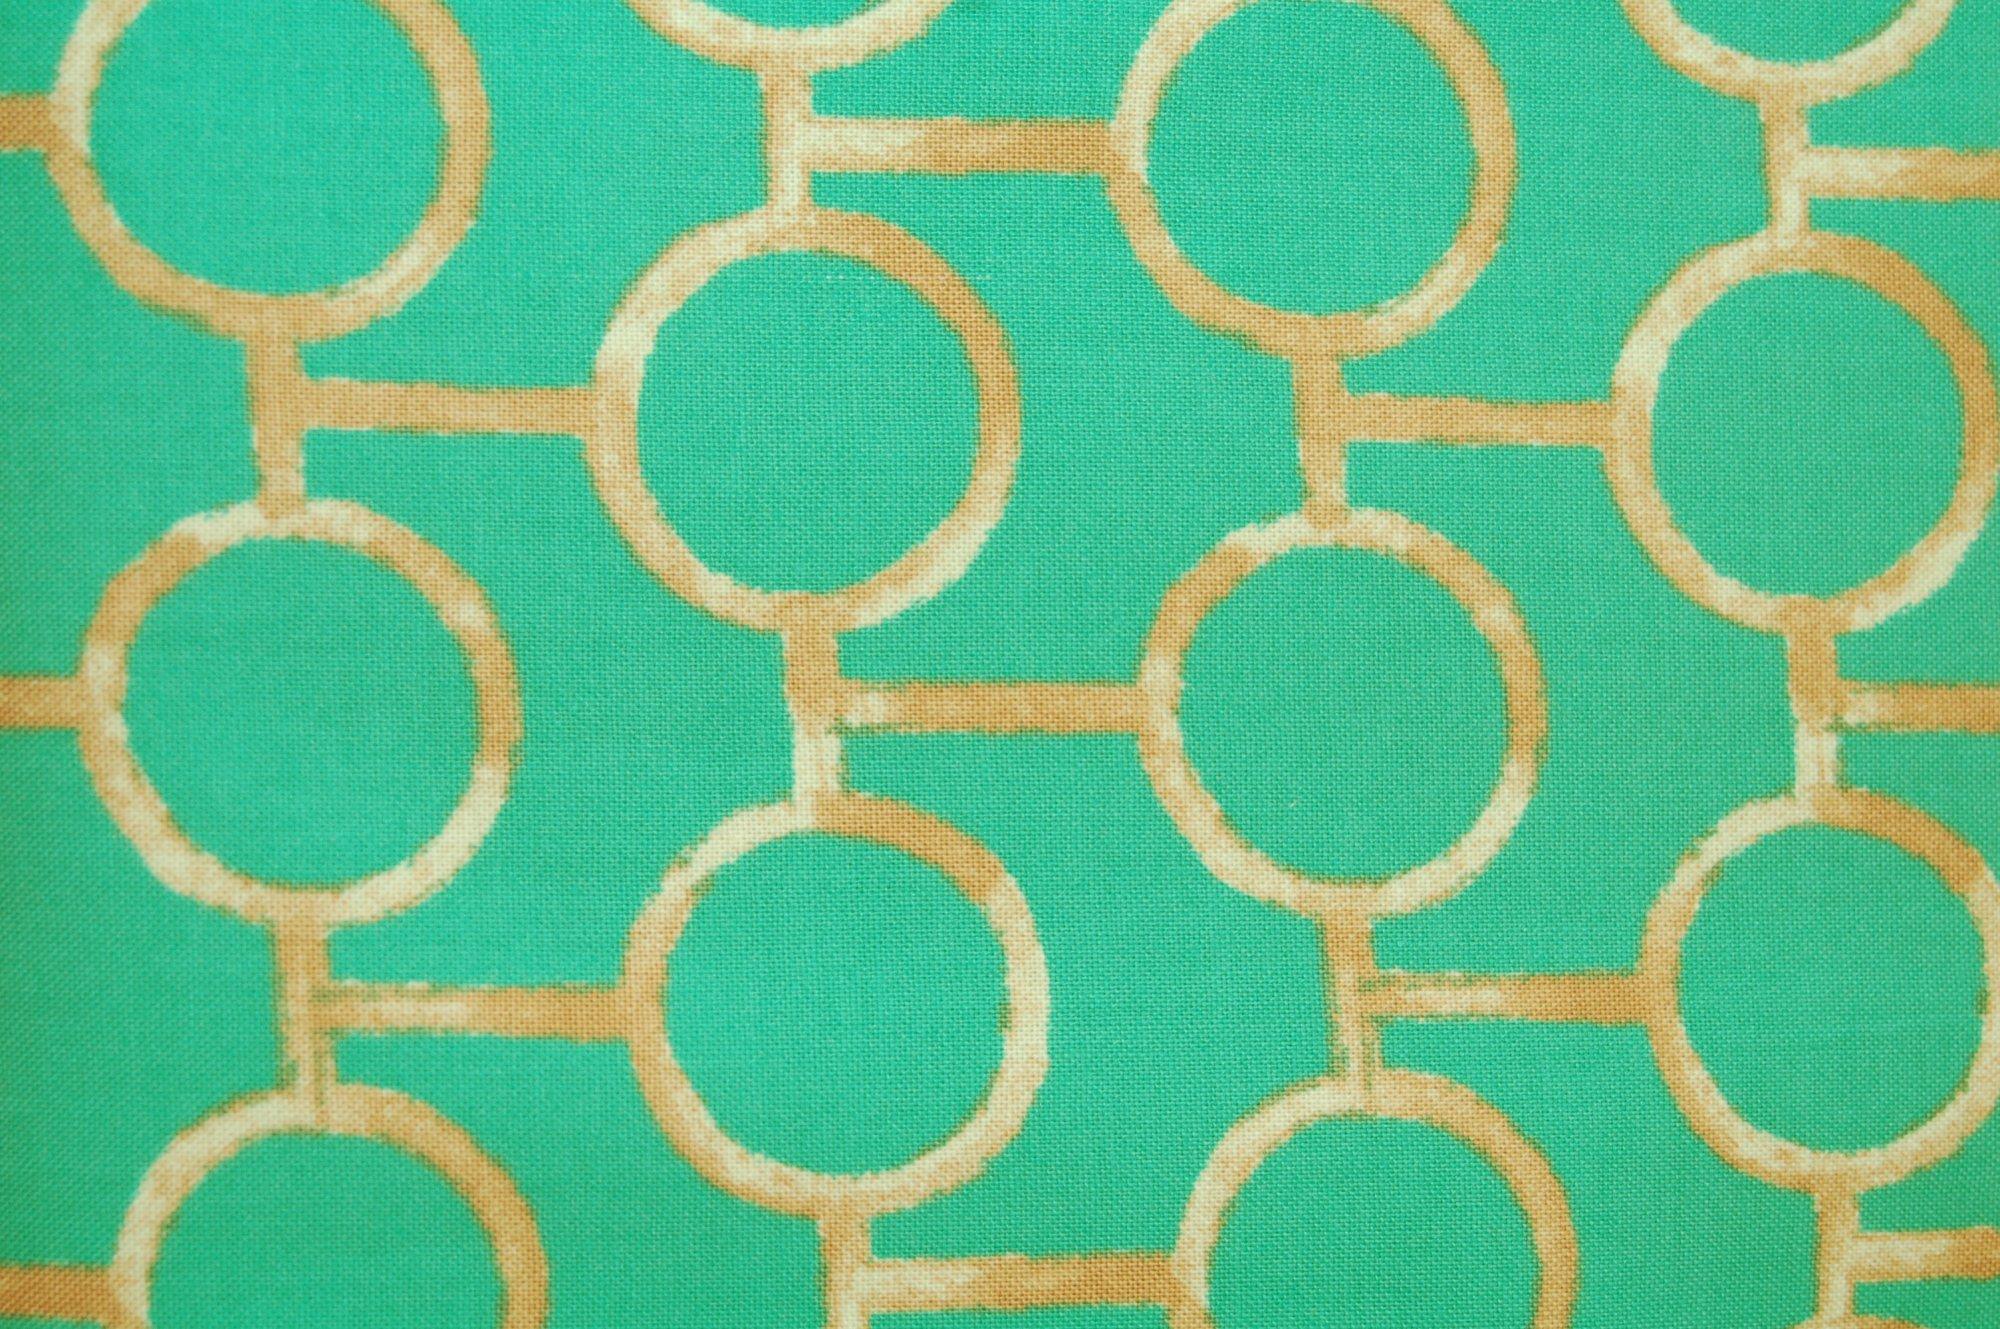 Godwin Orb (Pool) by Victoria & Albert for Rowan Fabrics